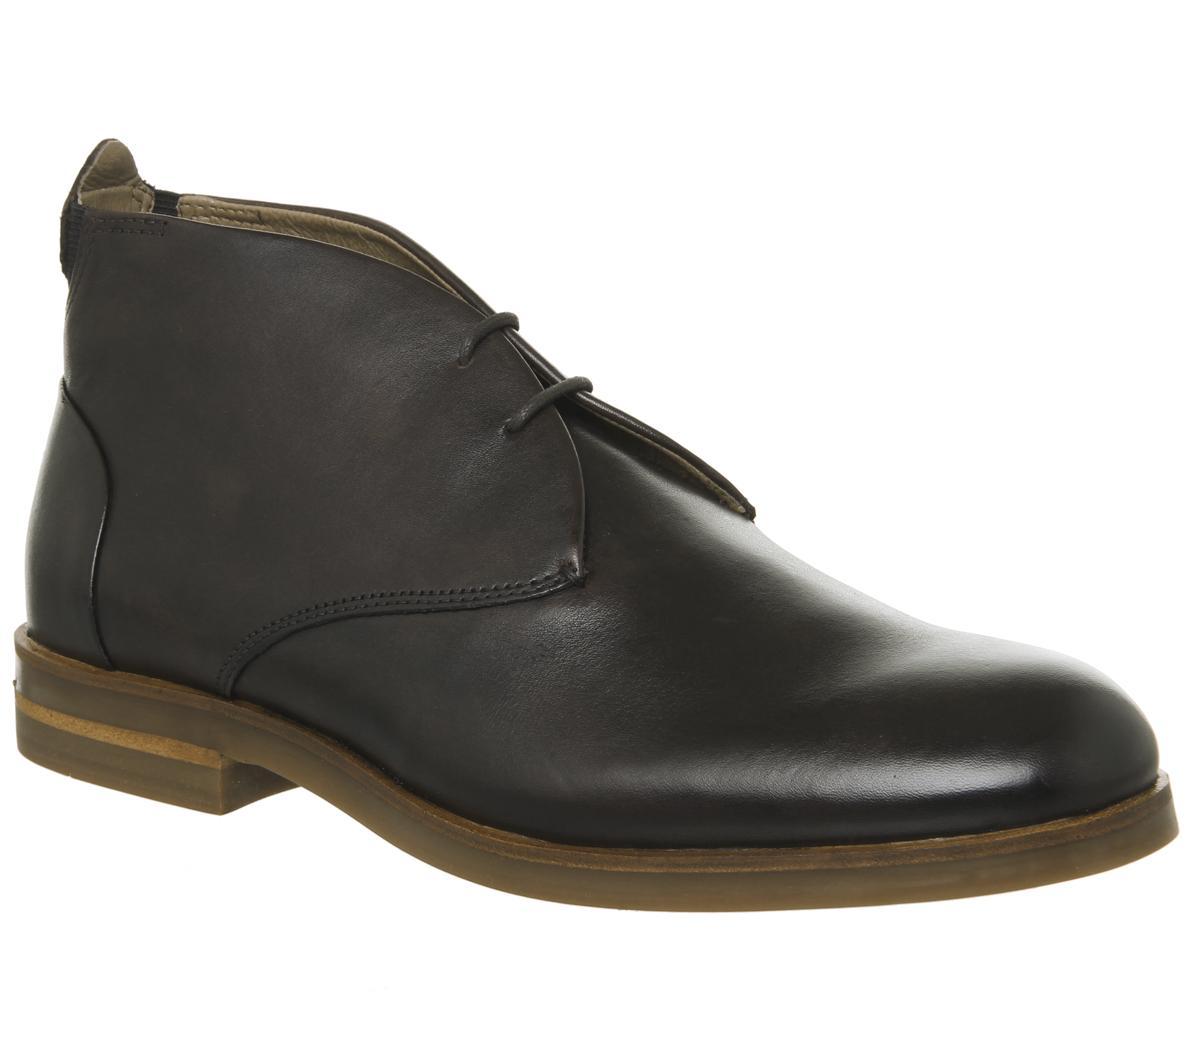 Bedlington Chukka Boots